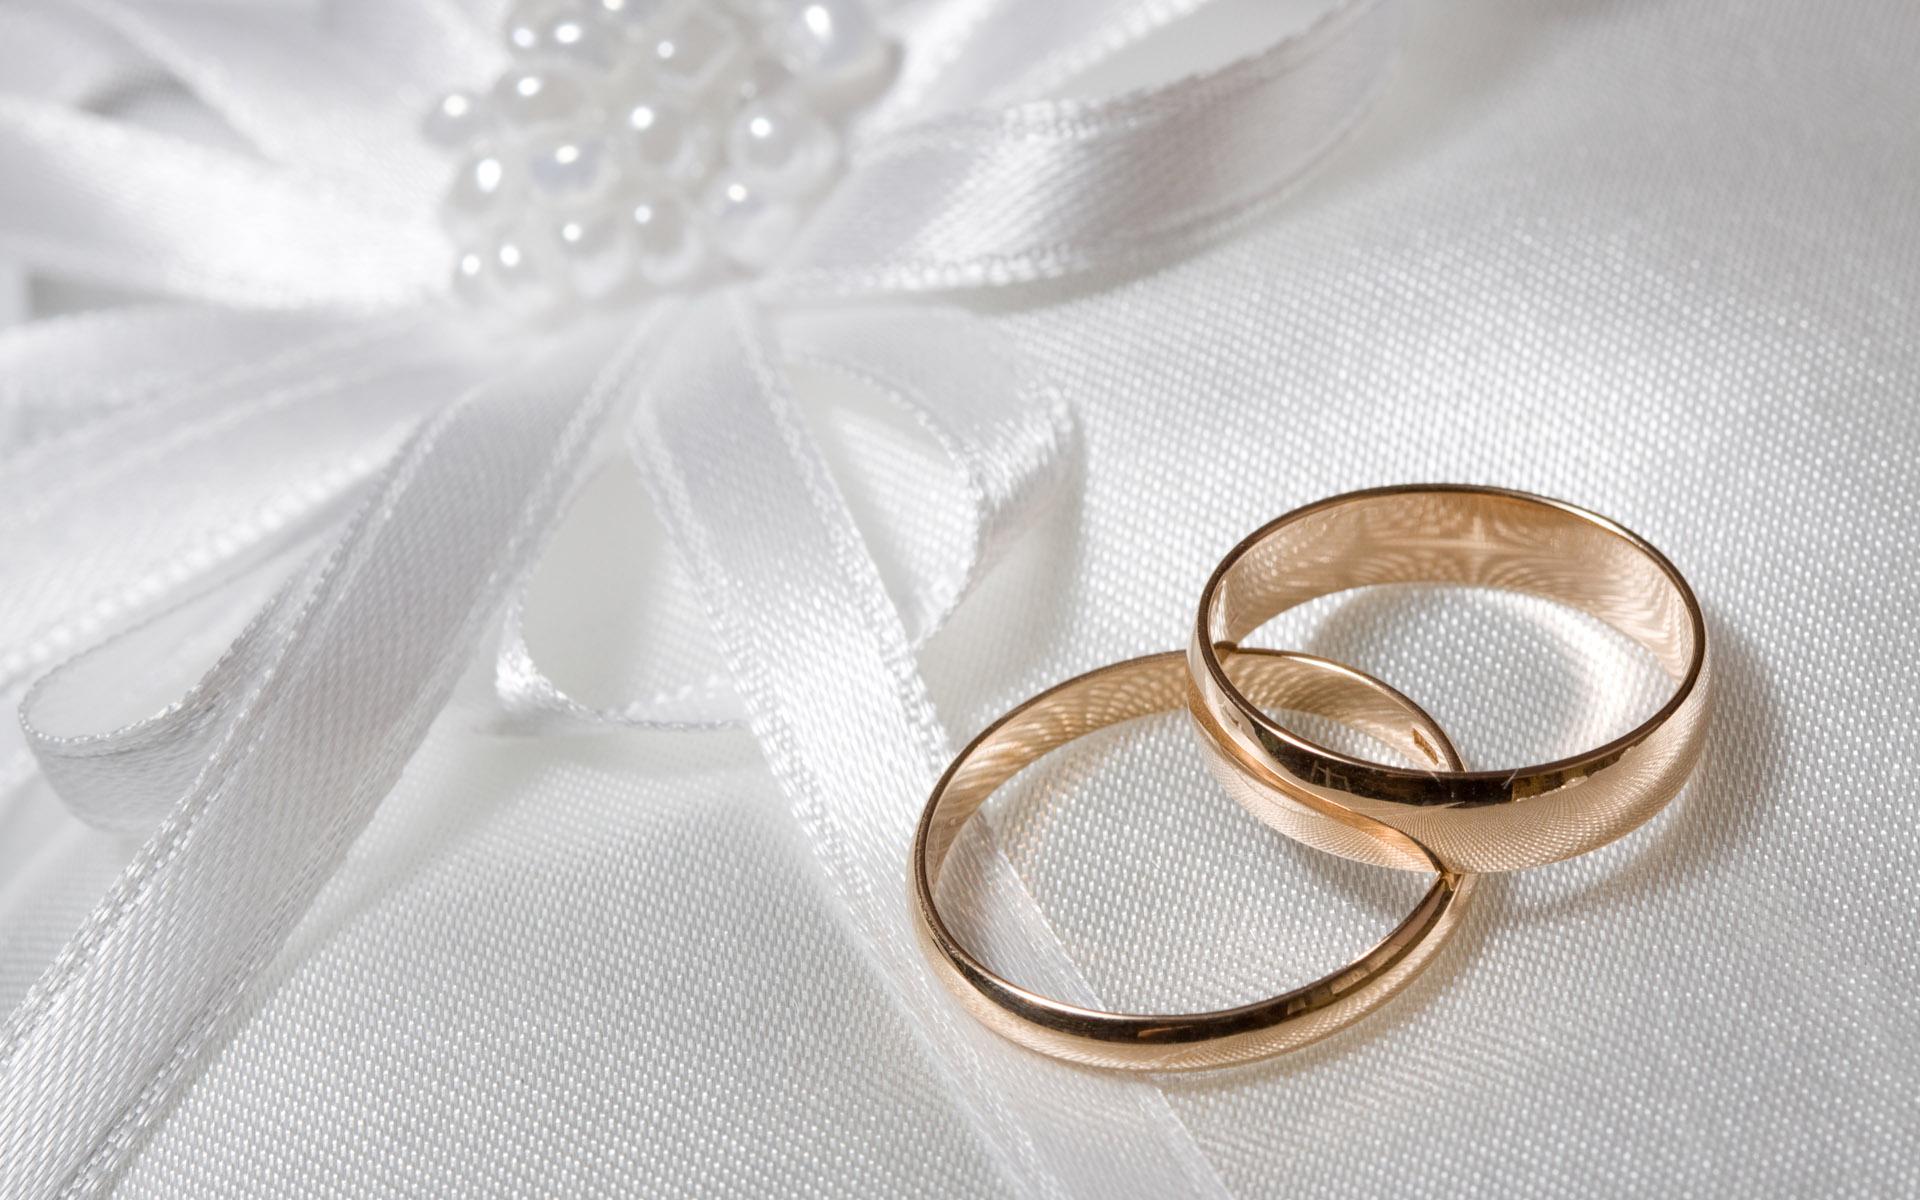 antique-wedding-rings-378175